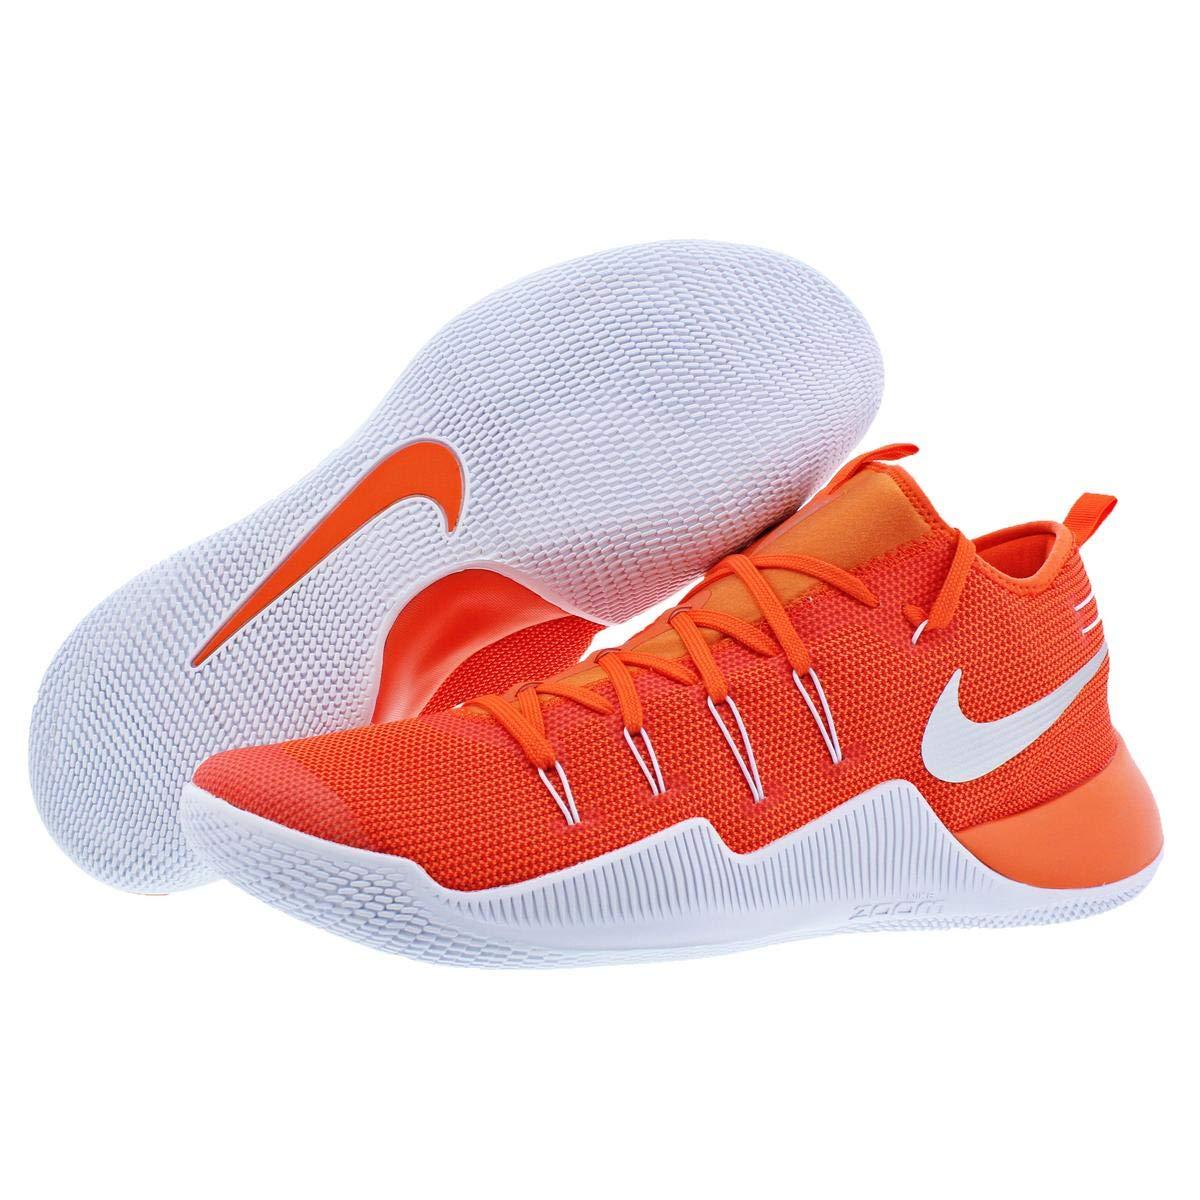 5200c9d76c25 Nike Hypershift TB Promo Men s Mesh Lace-Up Basketball Shoes Orange Size  18  Amazon.ca  Shoes   Handbags